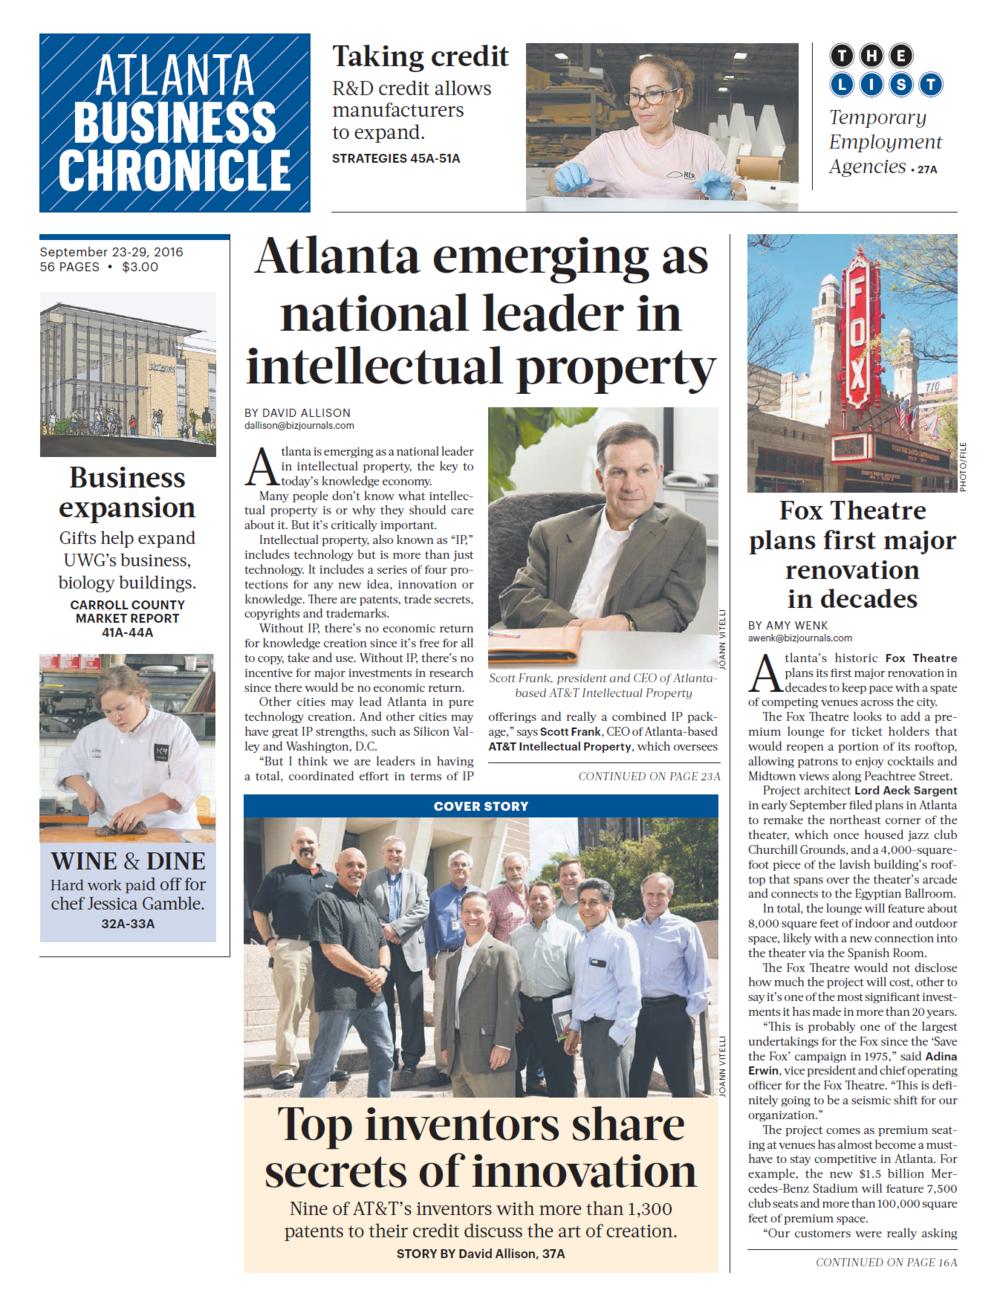 2016 09 - ABC - Atlanta Emerging as IP National Leader.png